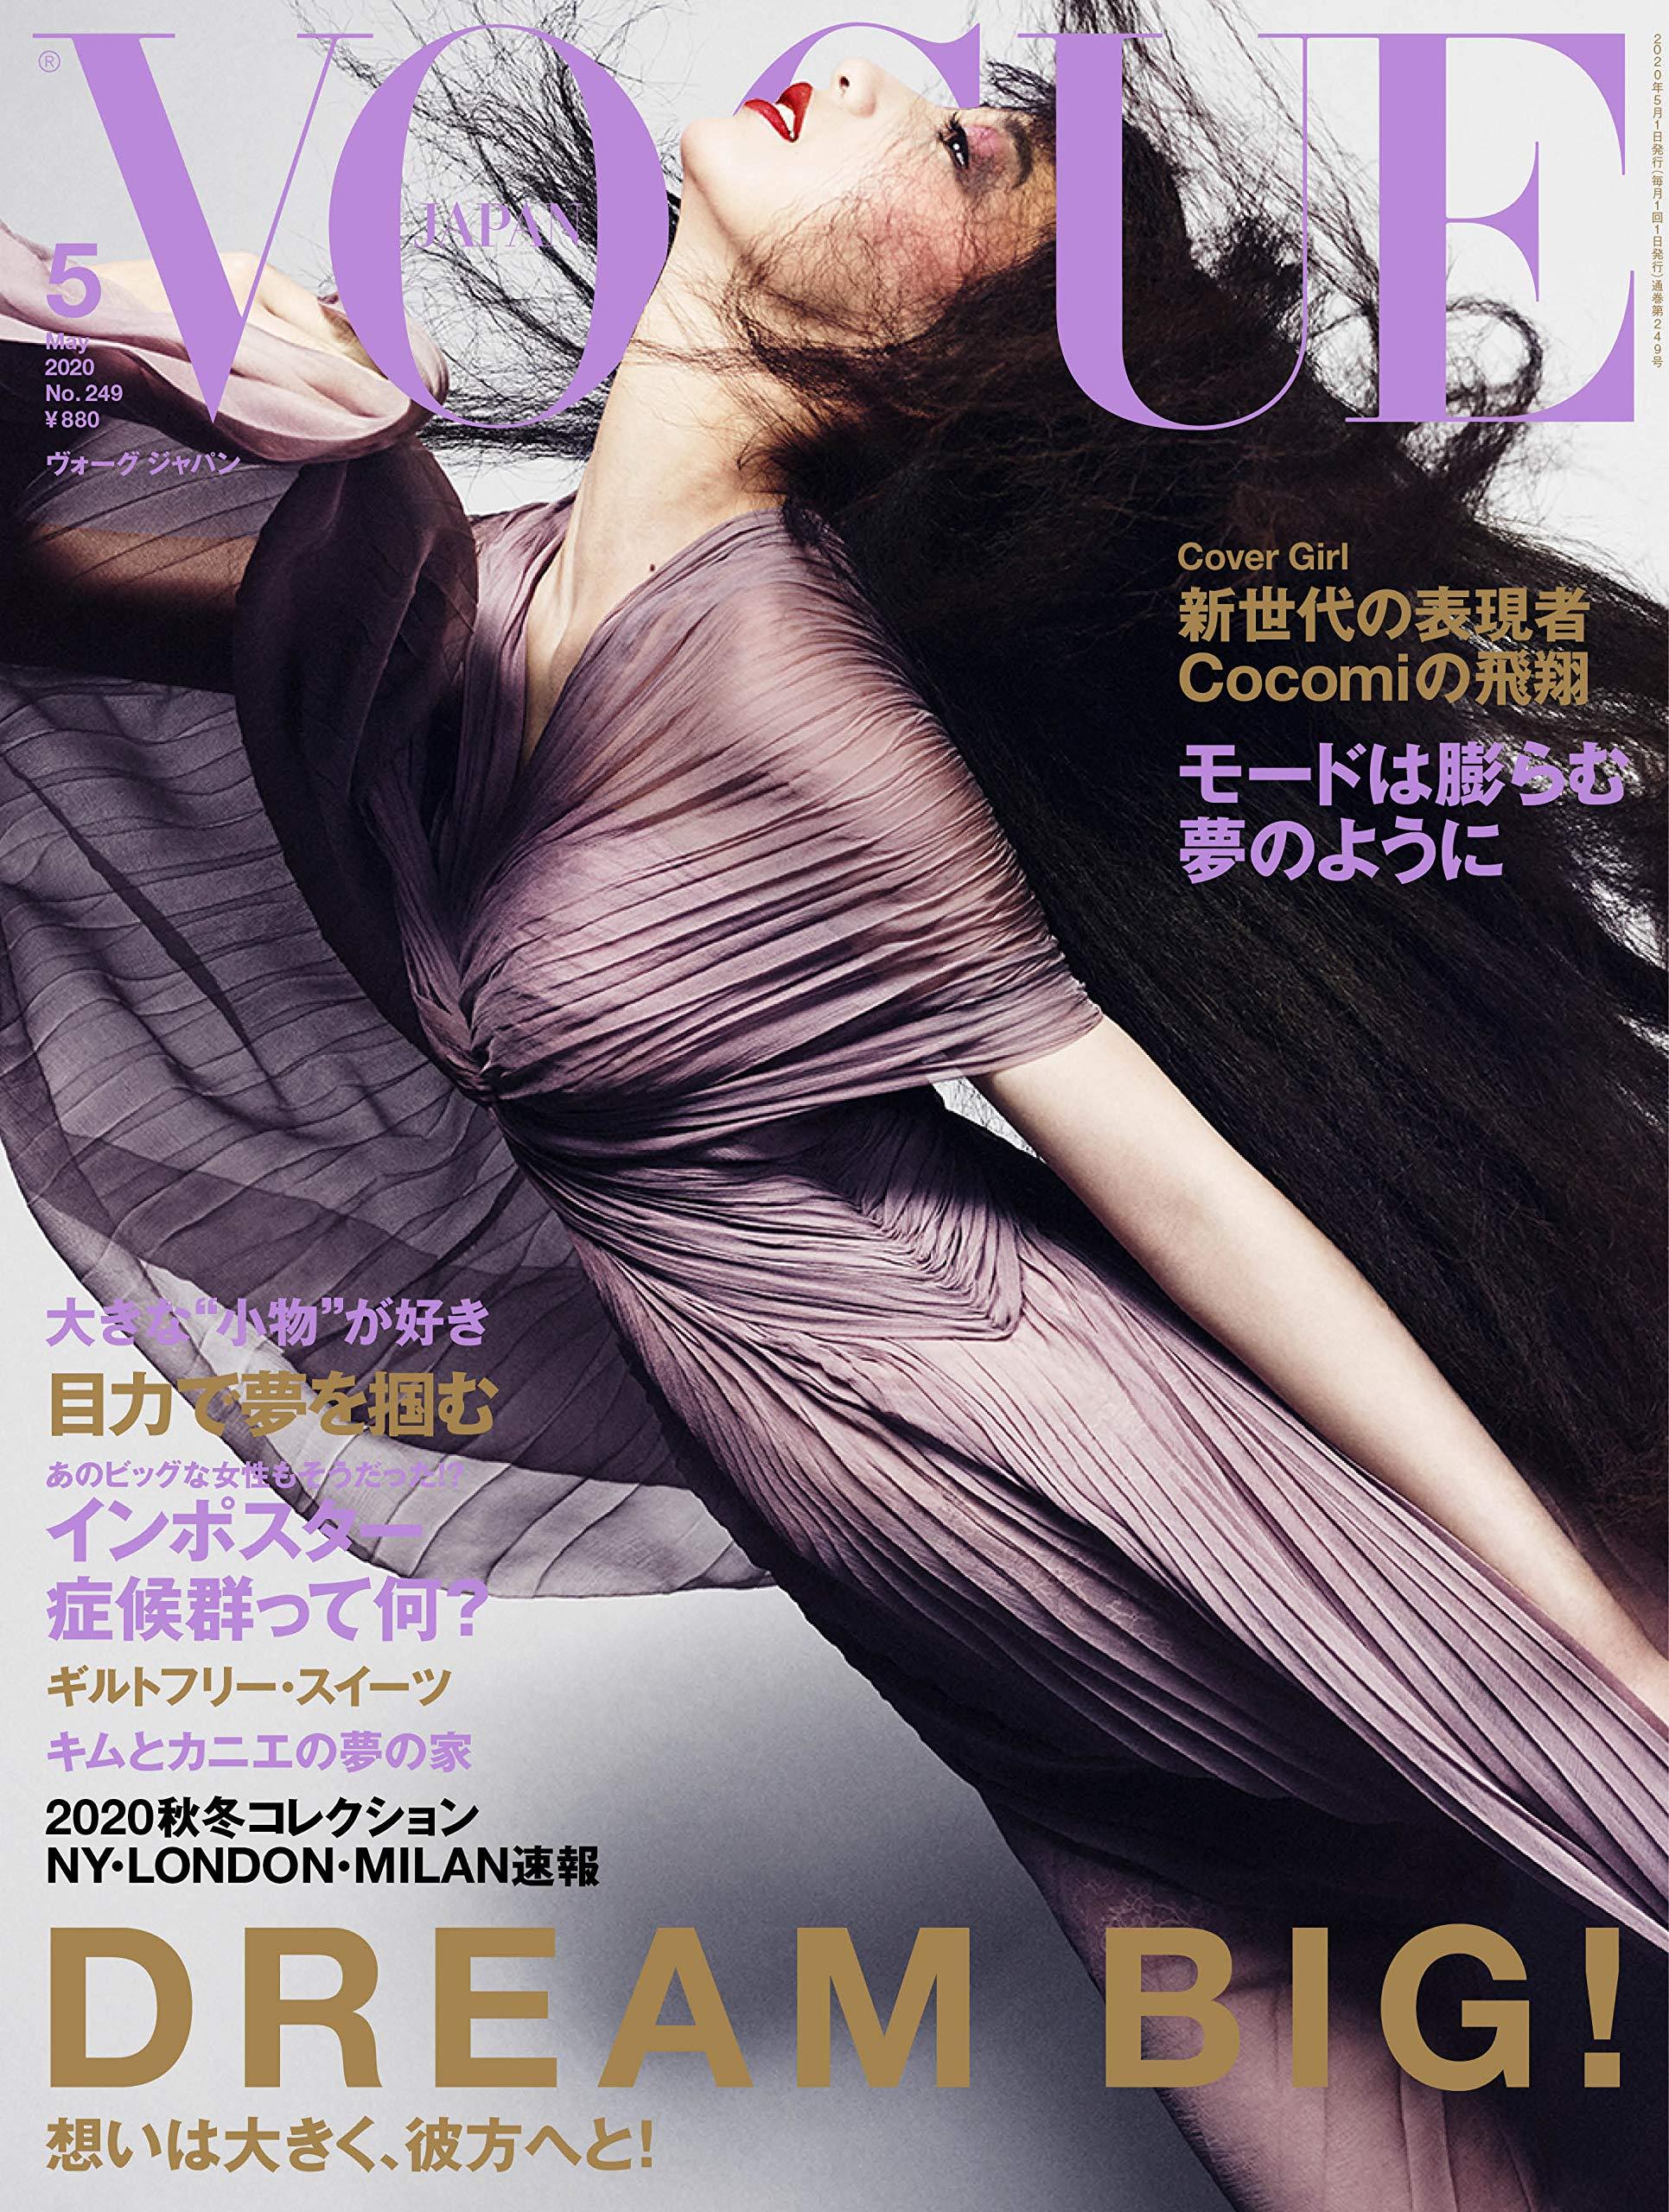 VOGUE JAPAN (ヴォーグジャパン) 2020年5月号: Amazon.es: Libros